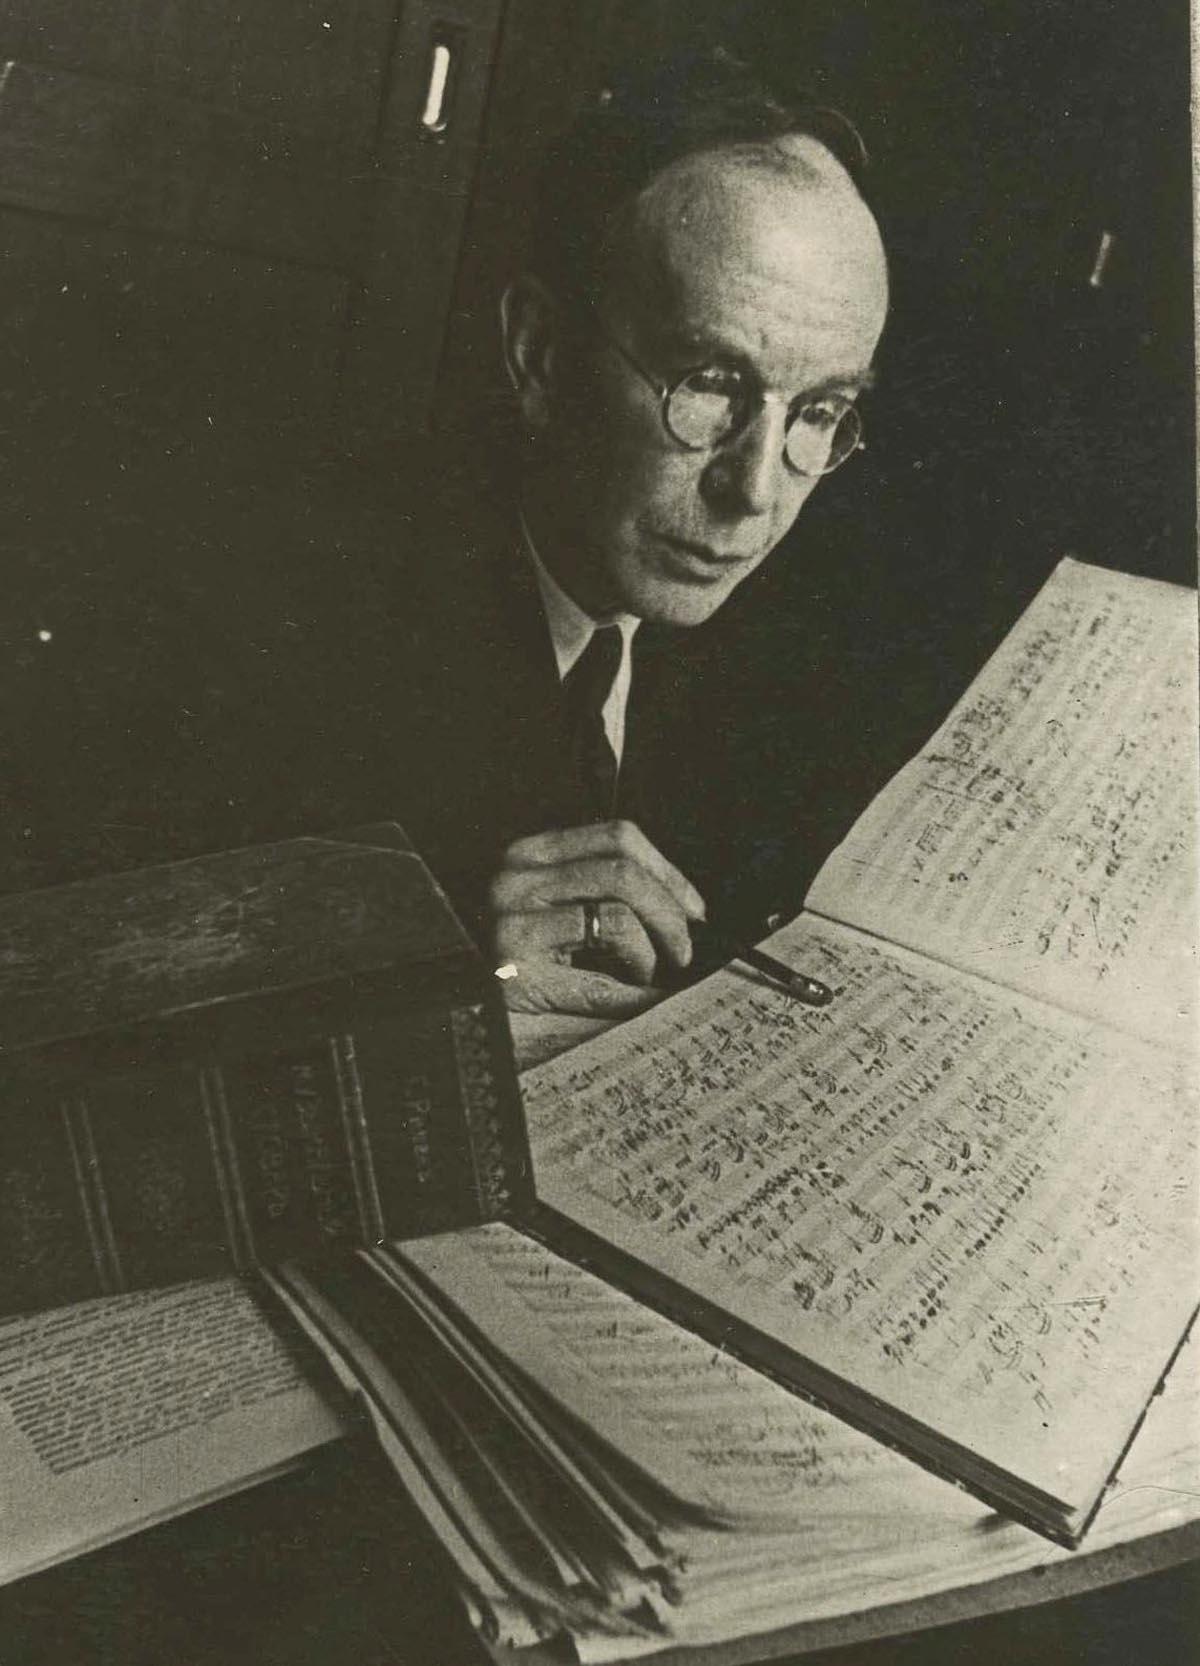 Андрей Николаевич Римский-Корсаков (1878-1940)